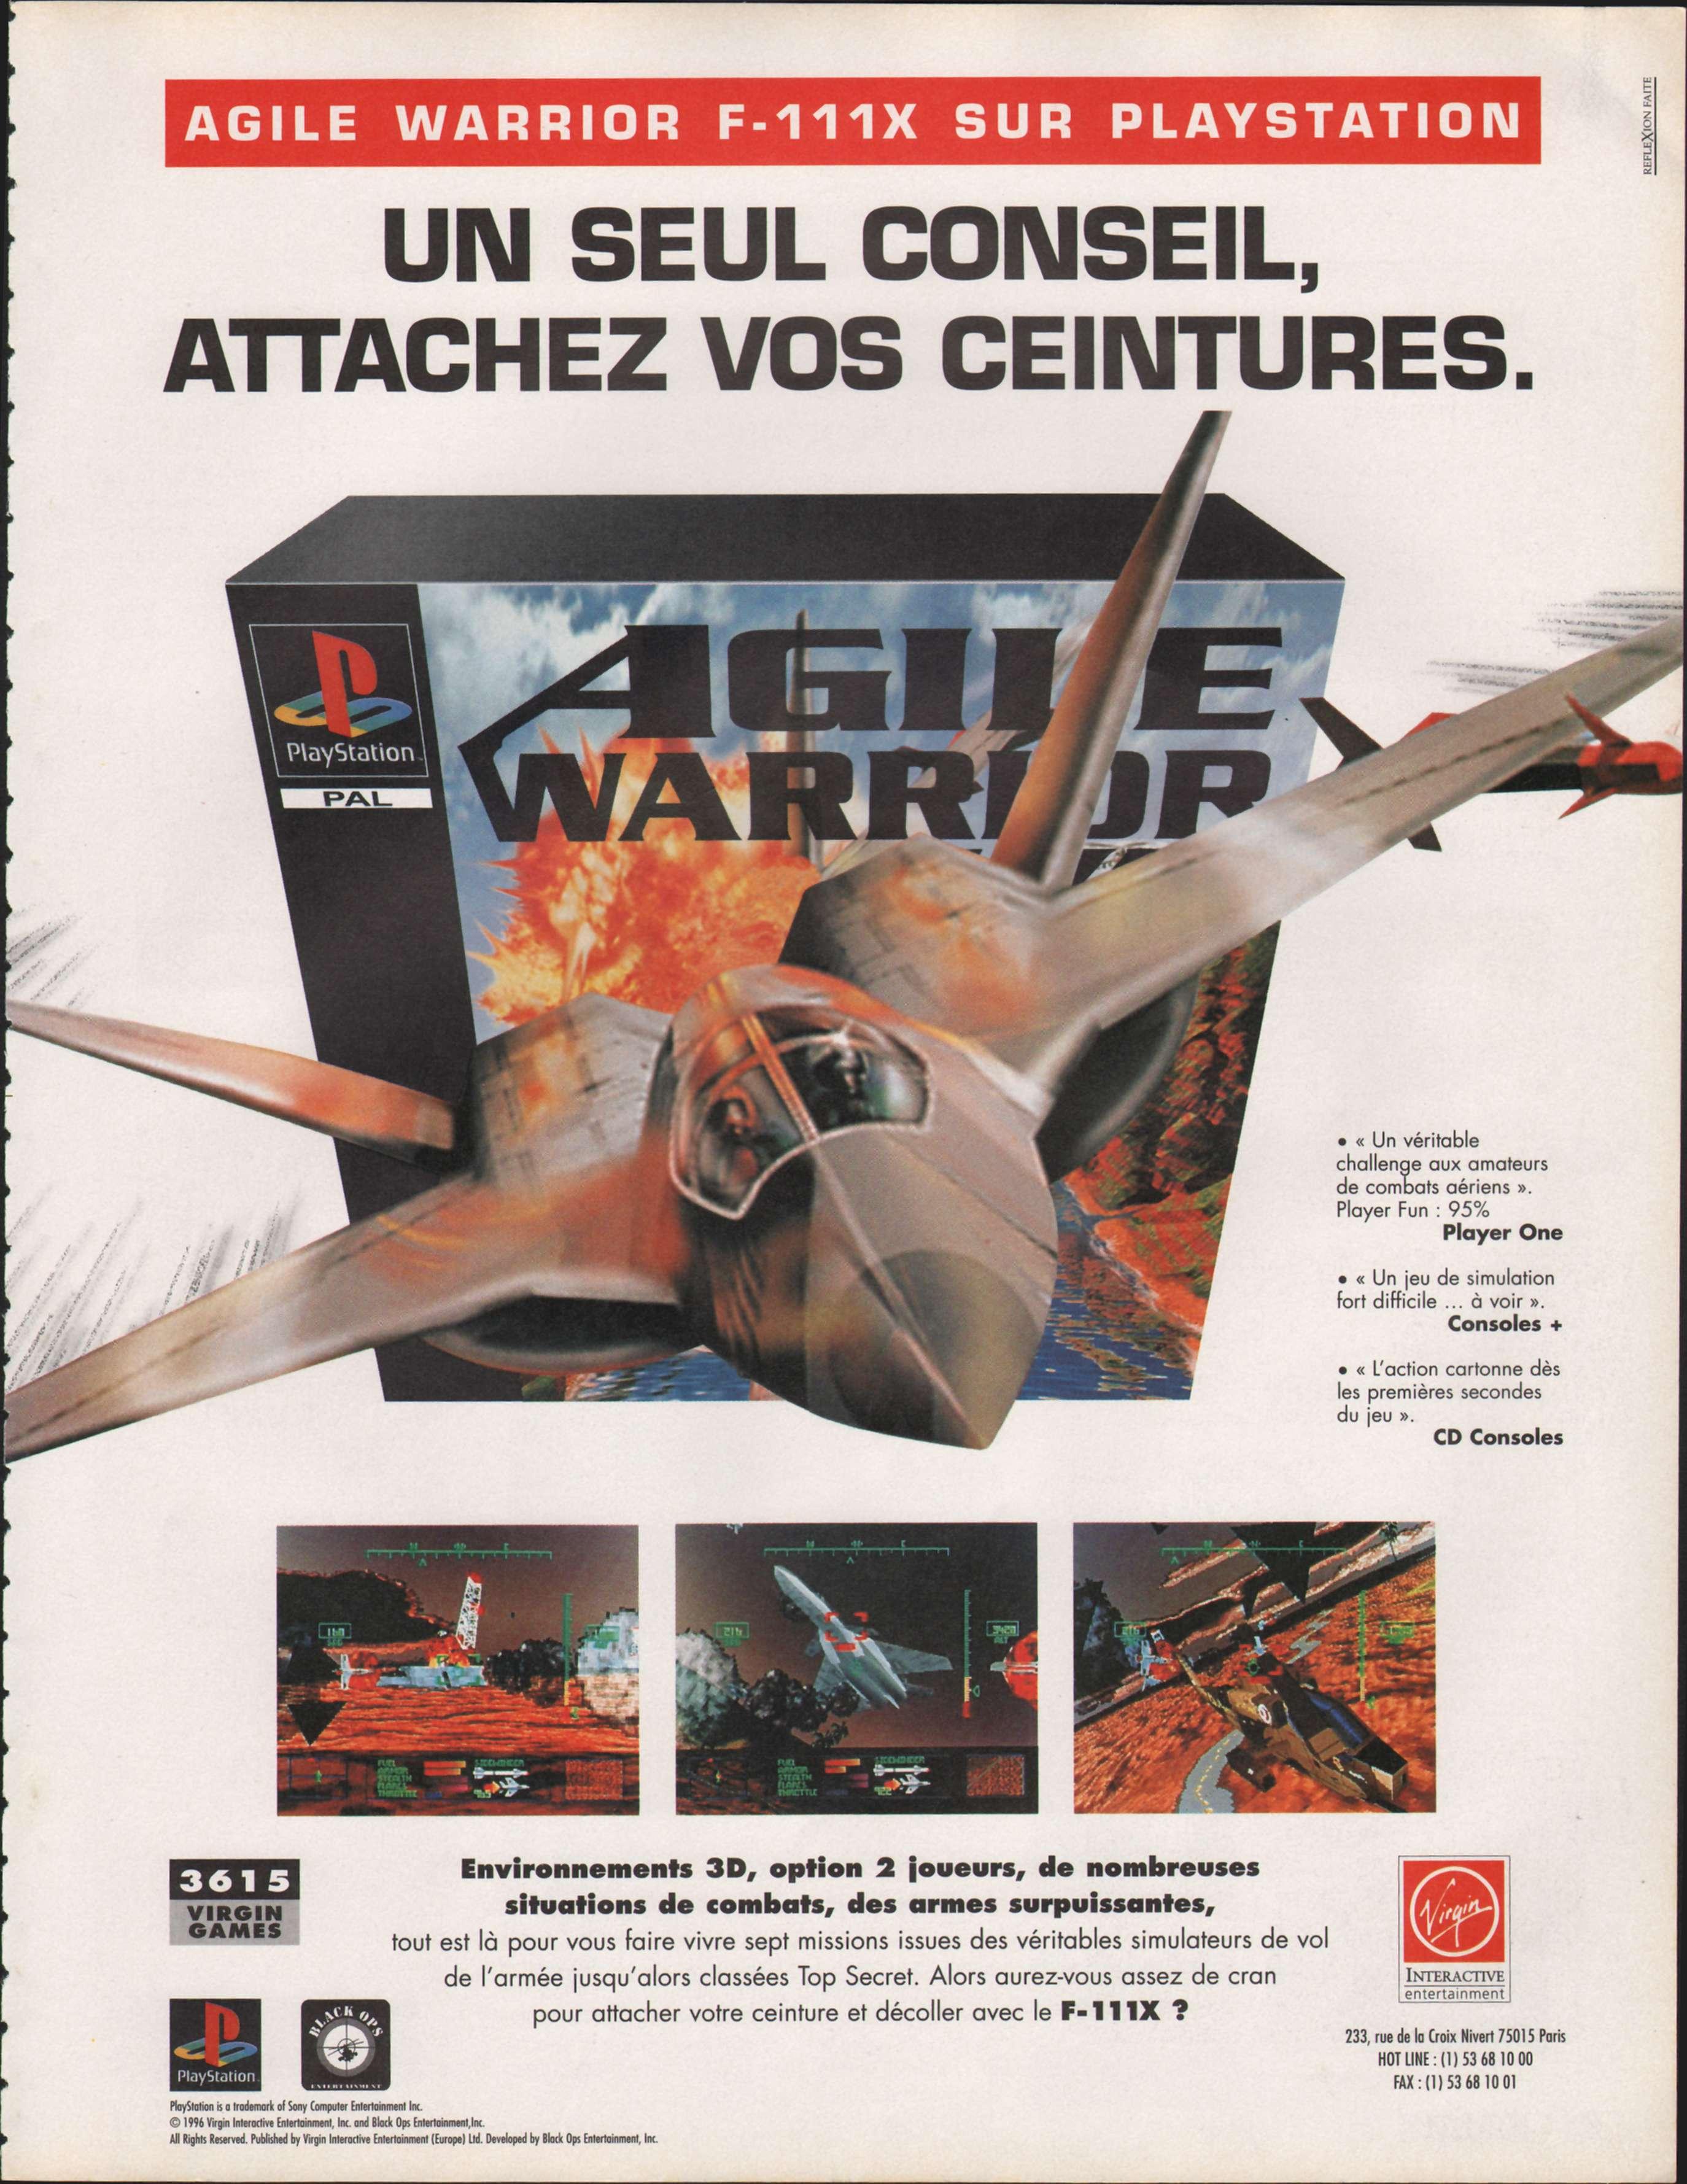 Agile warrior f-111x Playstation%20Magazine%20003%20-%20Page%20023%20(1996-05-06)